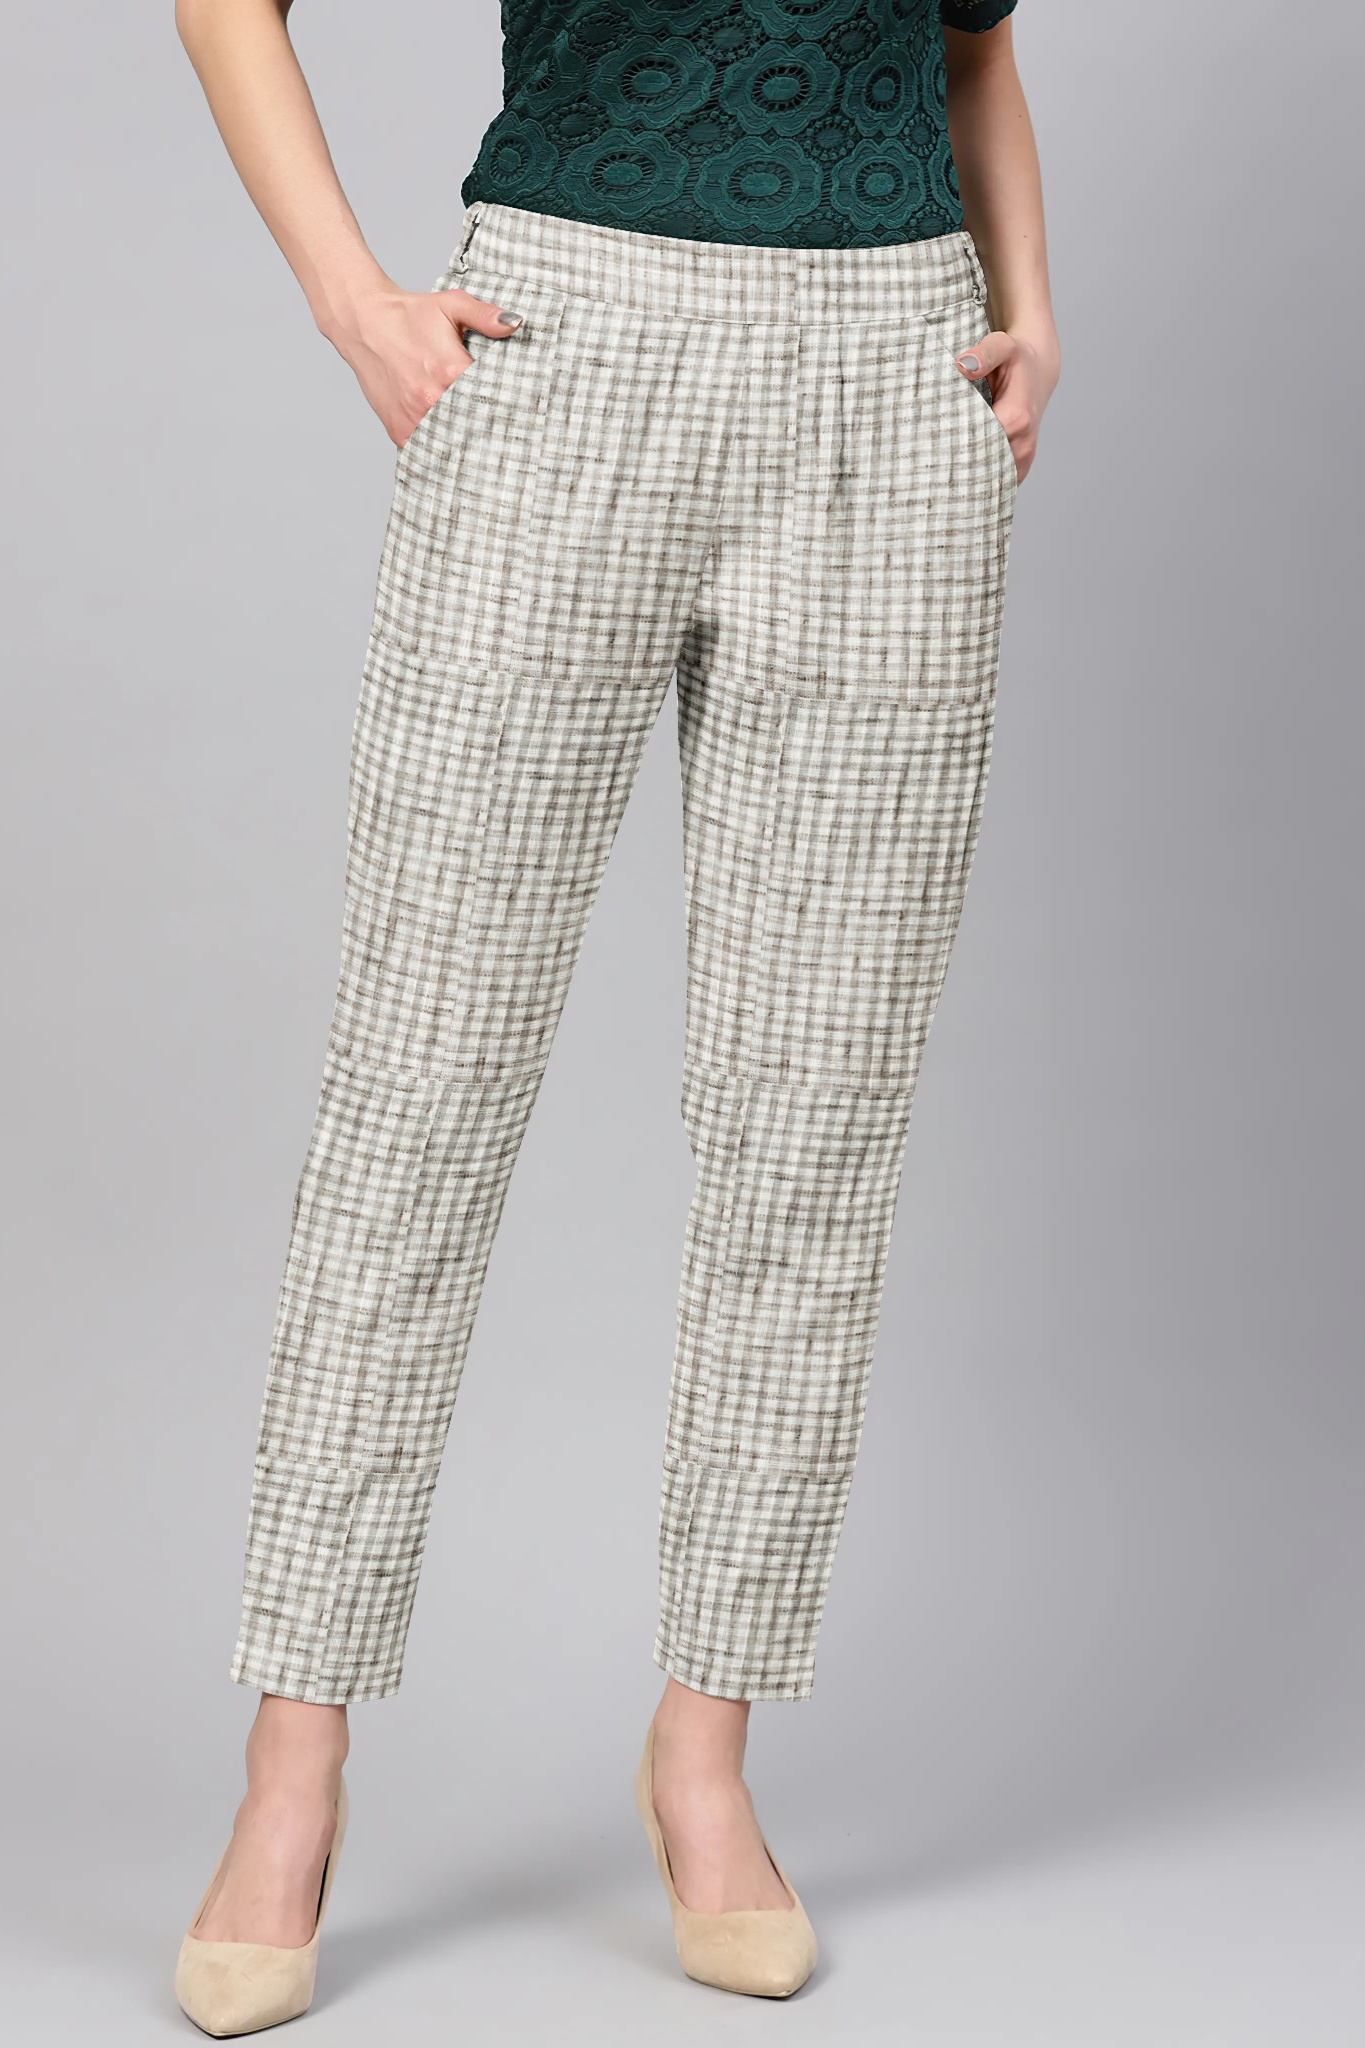 /home/customer/www/fabartcraft.com/public_html/uploadshttps://www.shopolics.com/uploads/images/medium/White-Black-Cotton-Check-Regular-Fit-Solid-Trouser-36073.jpg